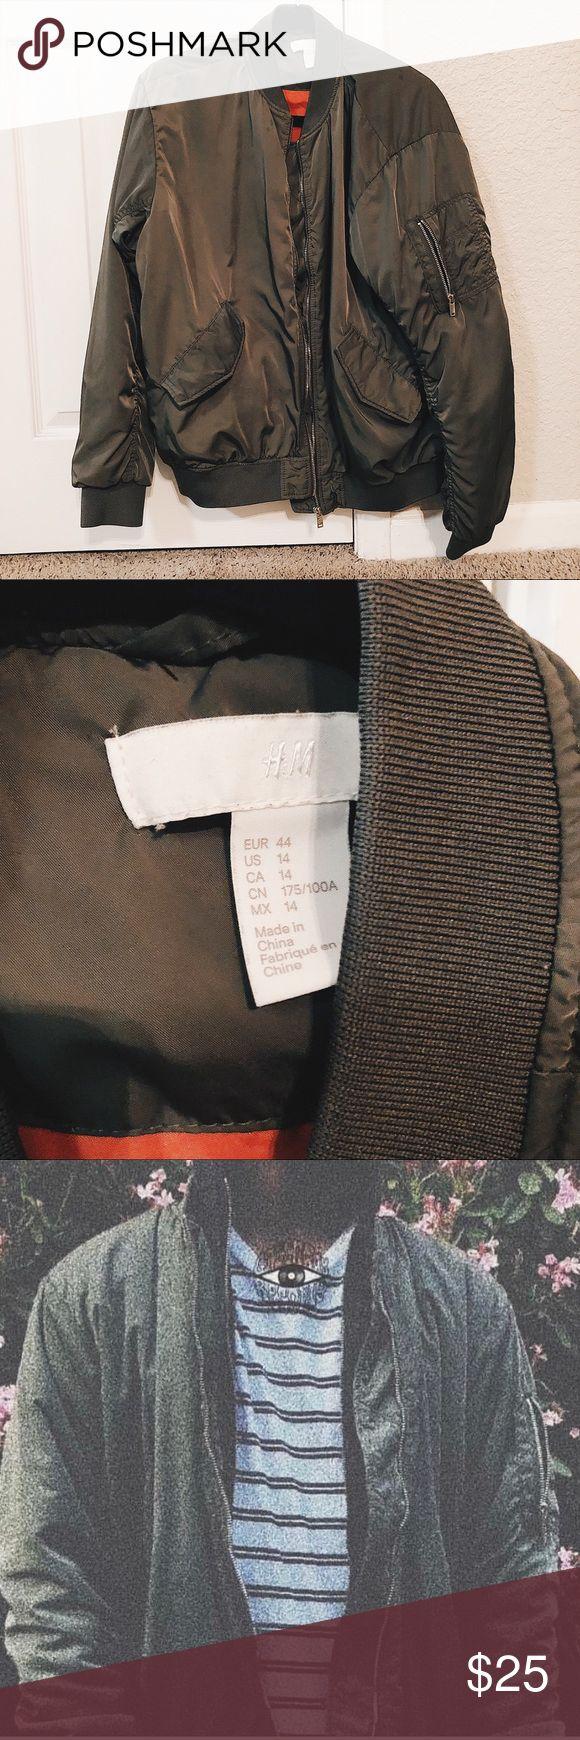 H&M Bomber Jacket Green bomber jacket, Bomber jacket